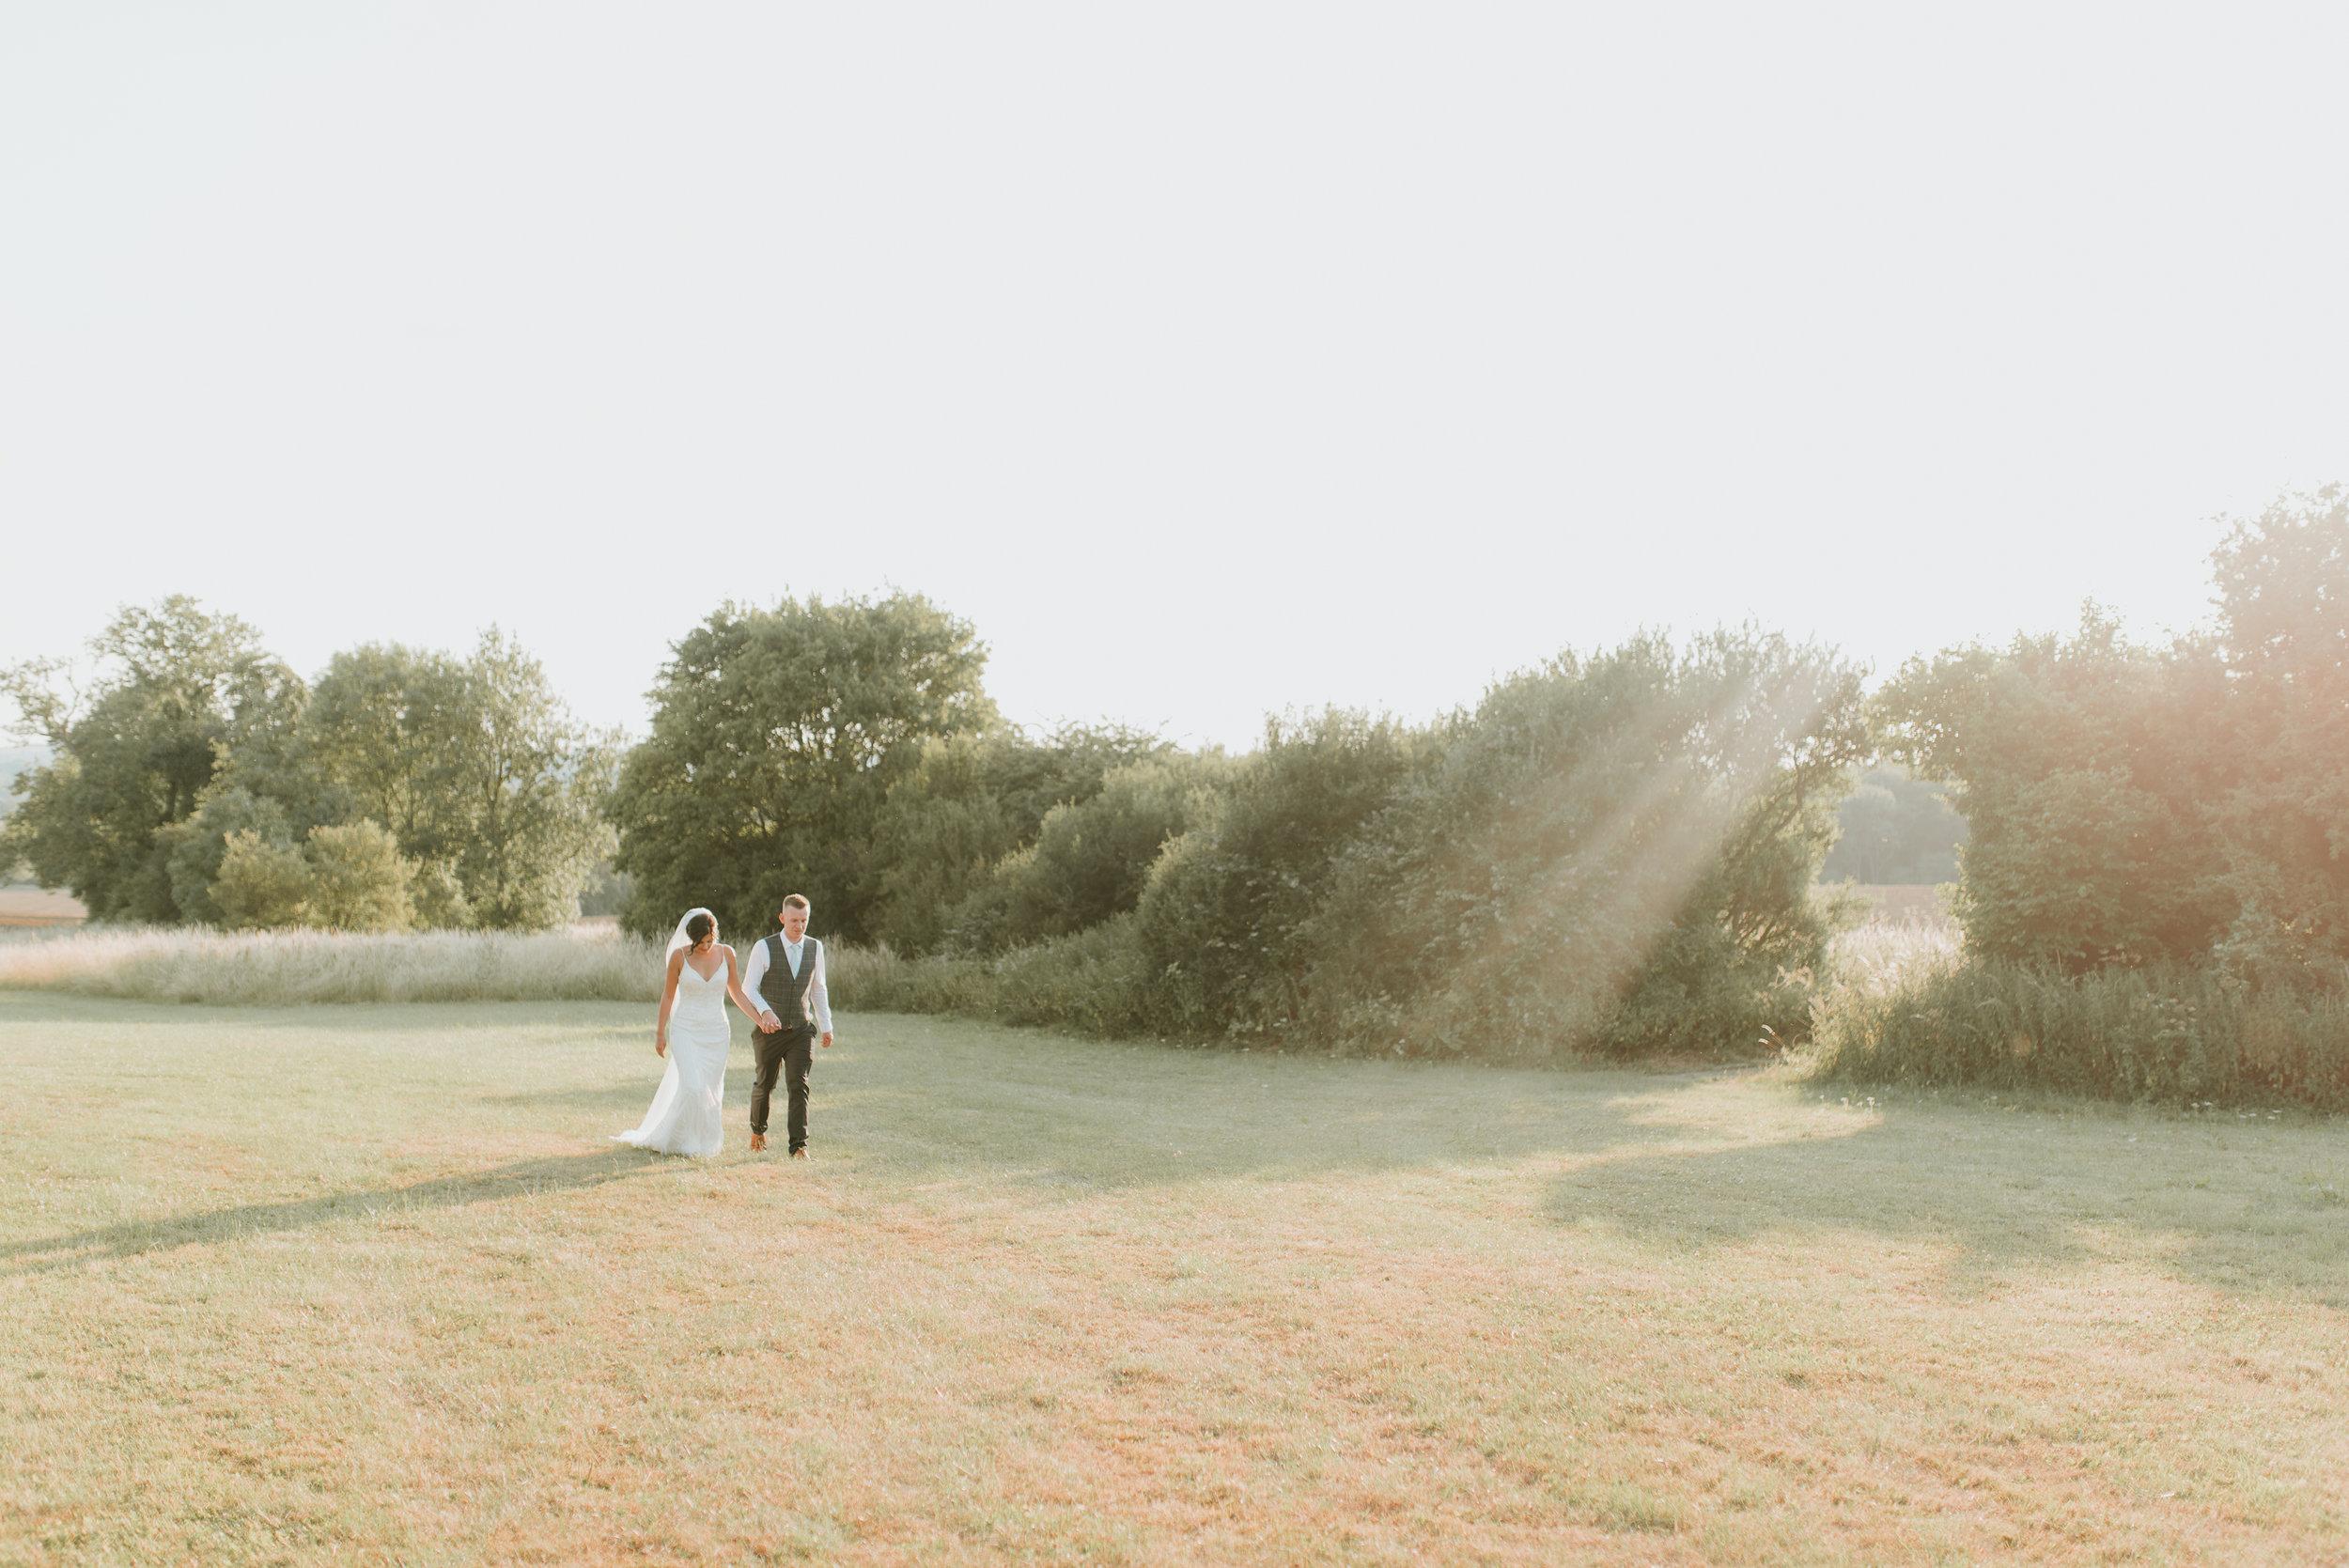 wedding photographer recommendations Oxfordshire